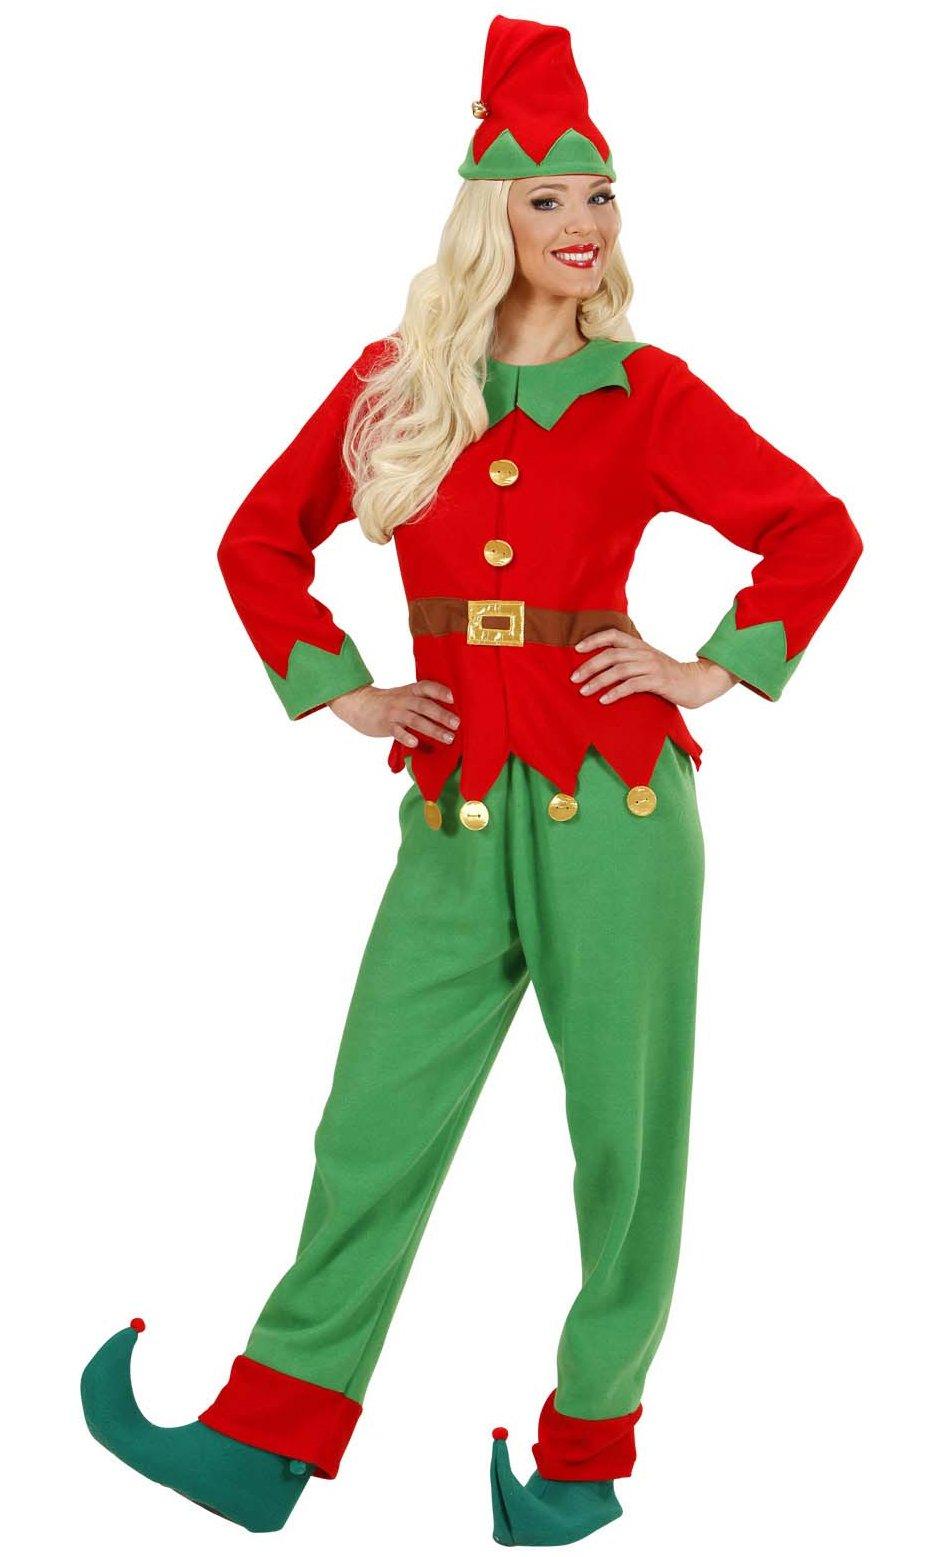 Elf-Costume-F4